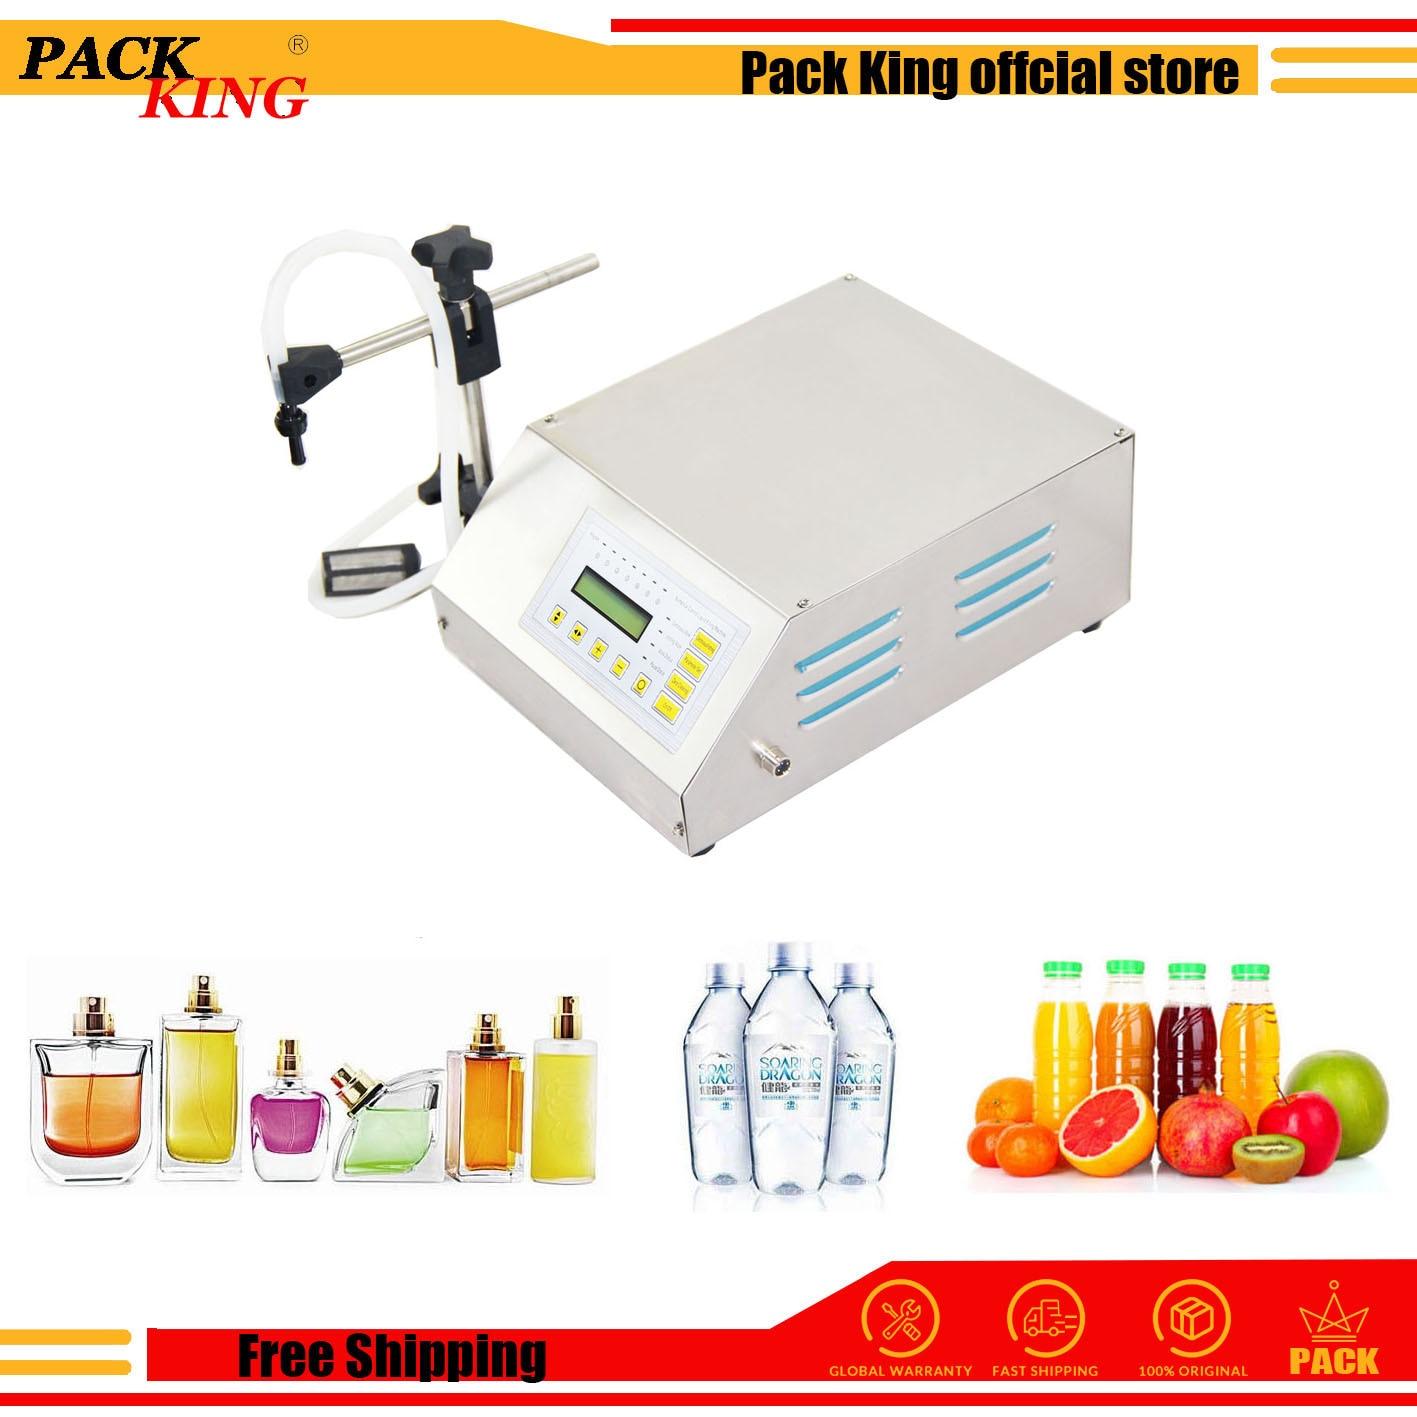 Liquid Water Perfume Filling Machine Milk Vinegar Soy Sauce Drinking Beverage Juice Digital Filler 3-5000ml Free Shipping